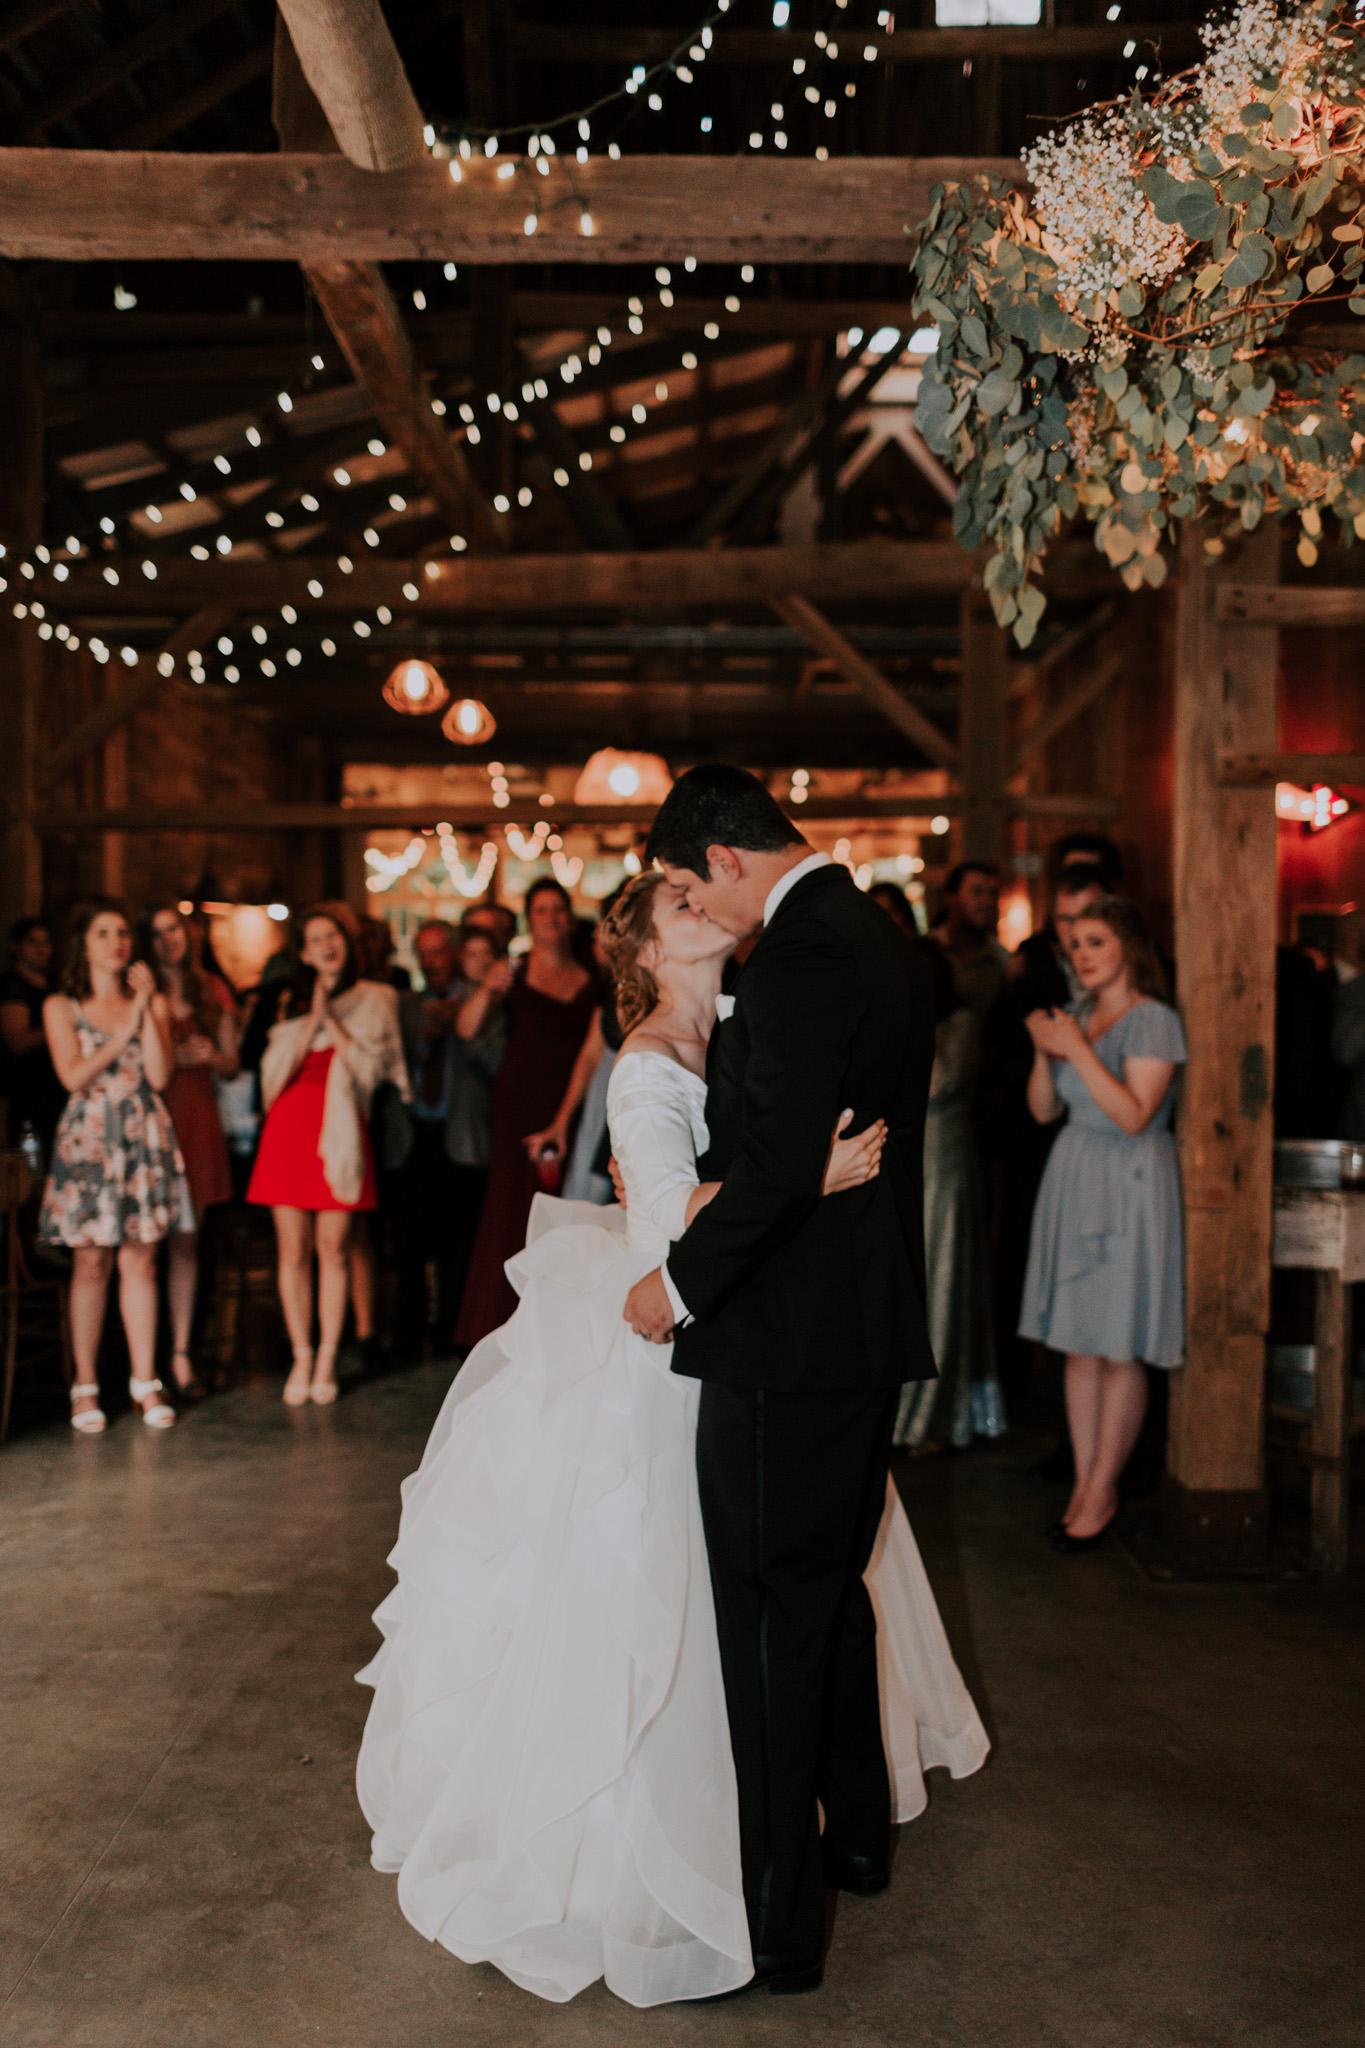 MillCreek-Wilde-Wedding-Barn-Michigan-Eliza-Eric-Vafa-Photo1092.jpg